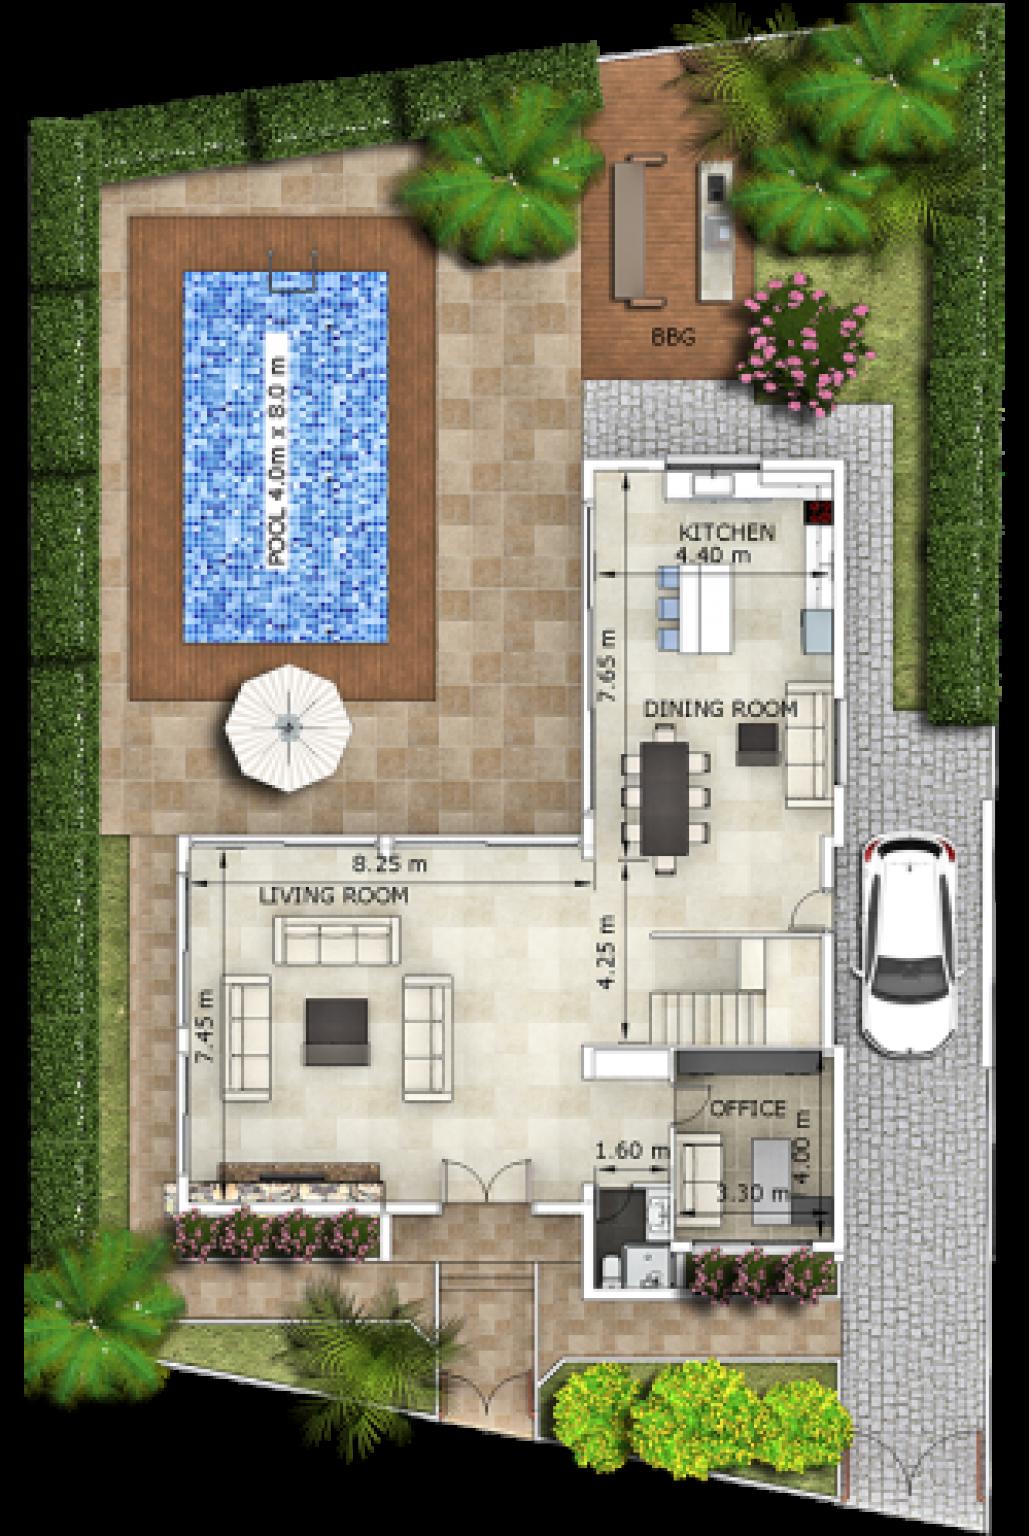 For Sale Brand New Luxury House For Sale Near The Sea Eur 1 700 000 Planta De Moradia Planta De Sitios Projectos De Casas